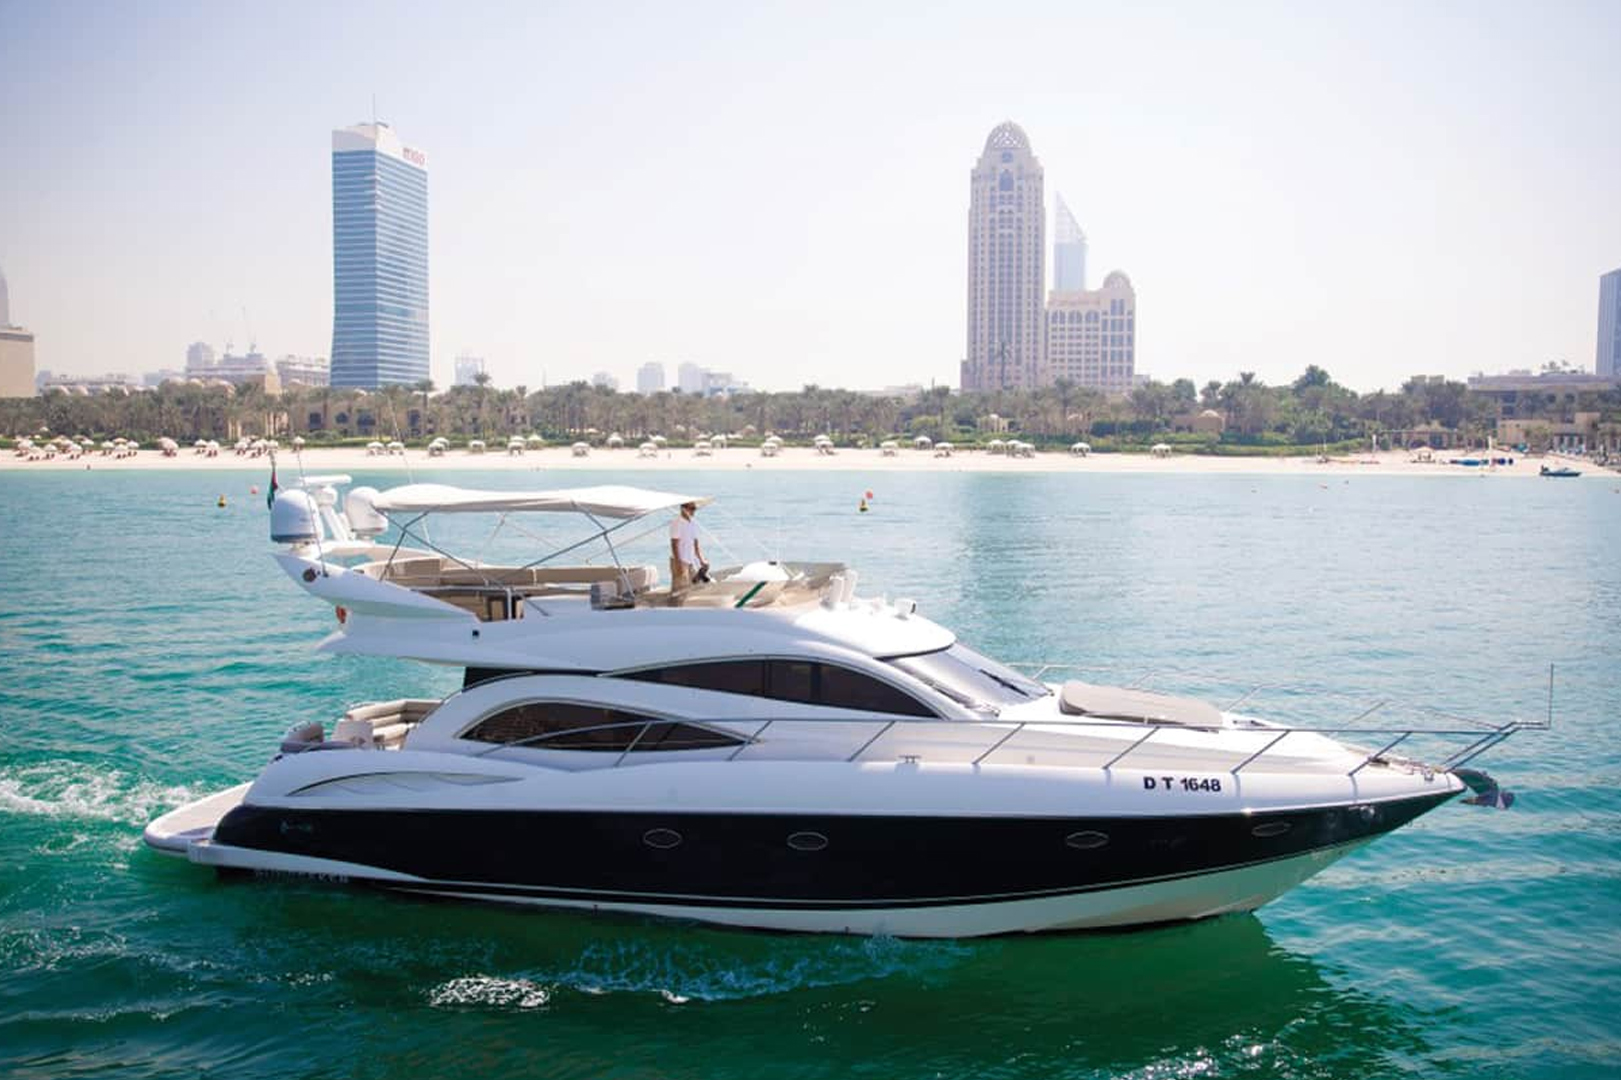 55ft day dream - Yachts Rental Dubai